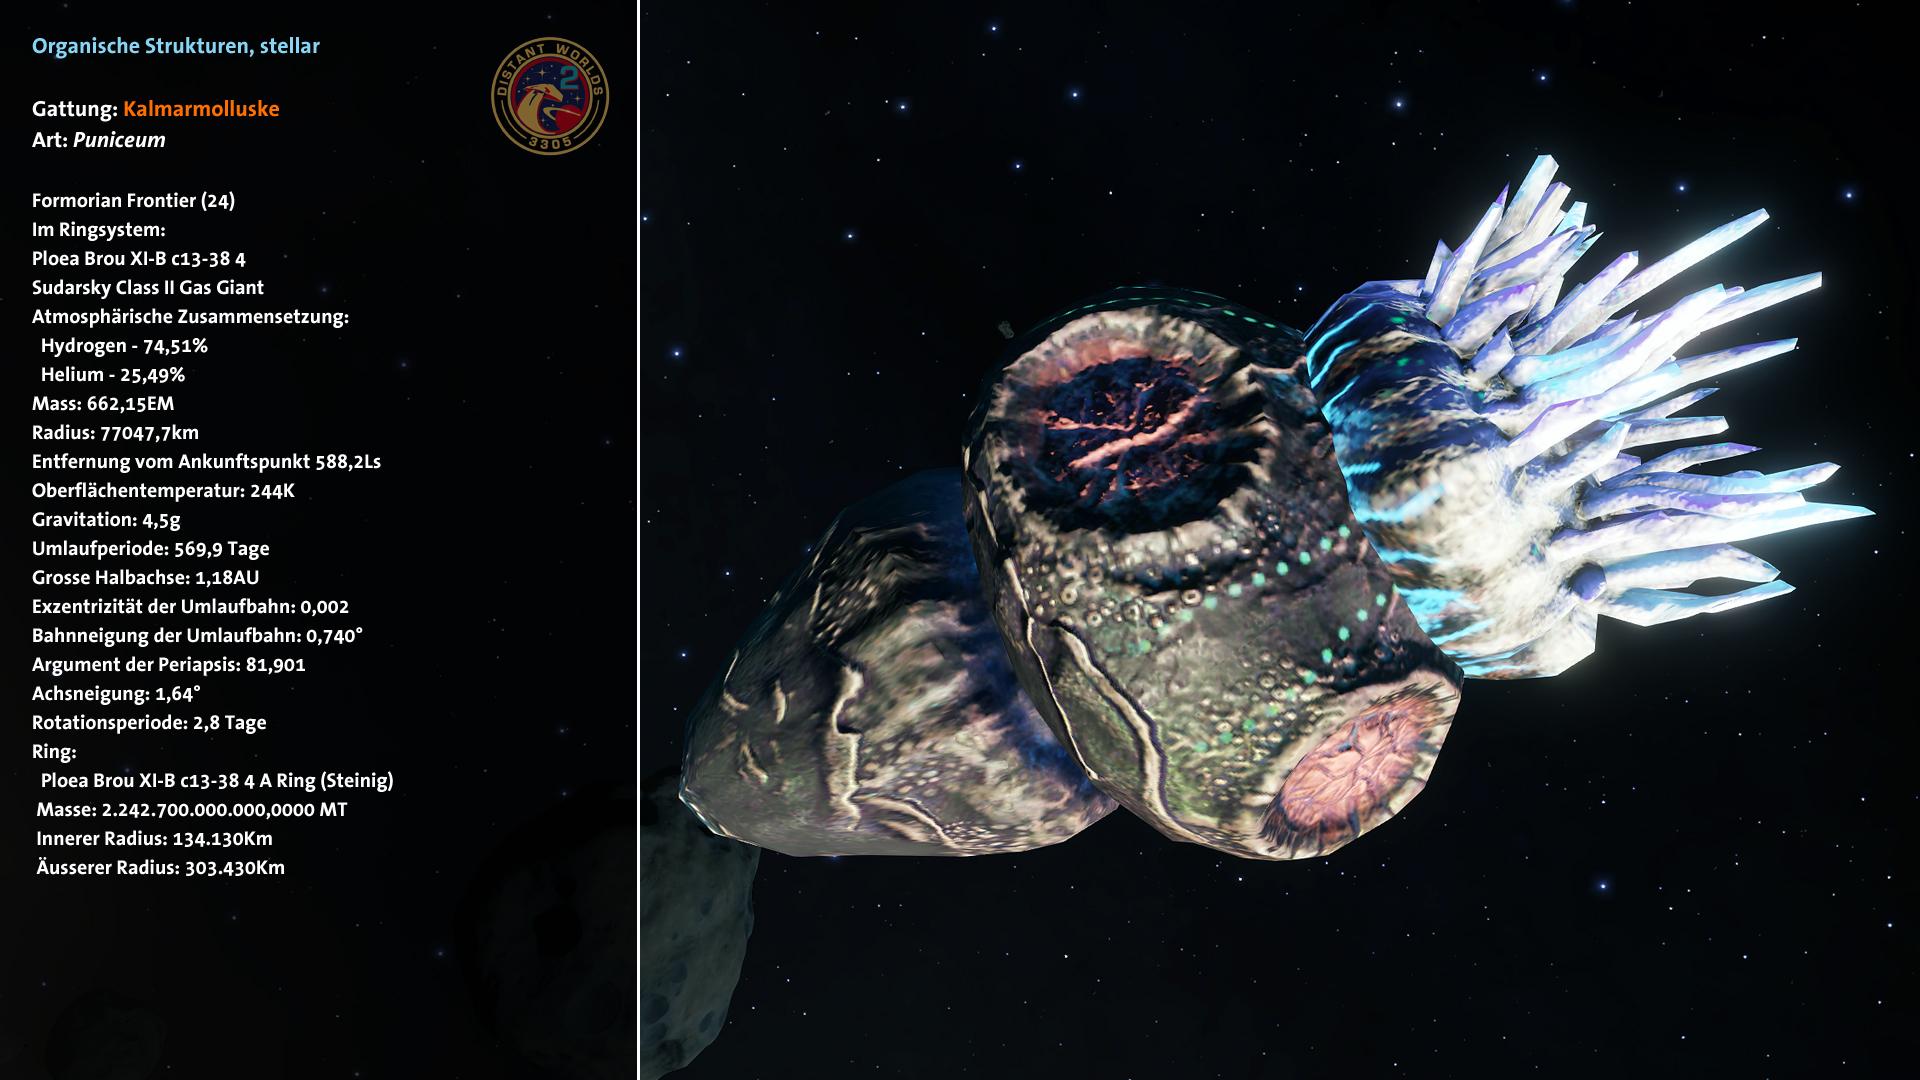 dw2-10-019-biostellarqnk92.jpg